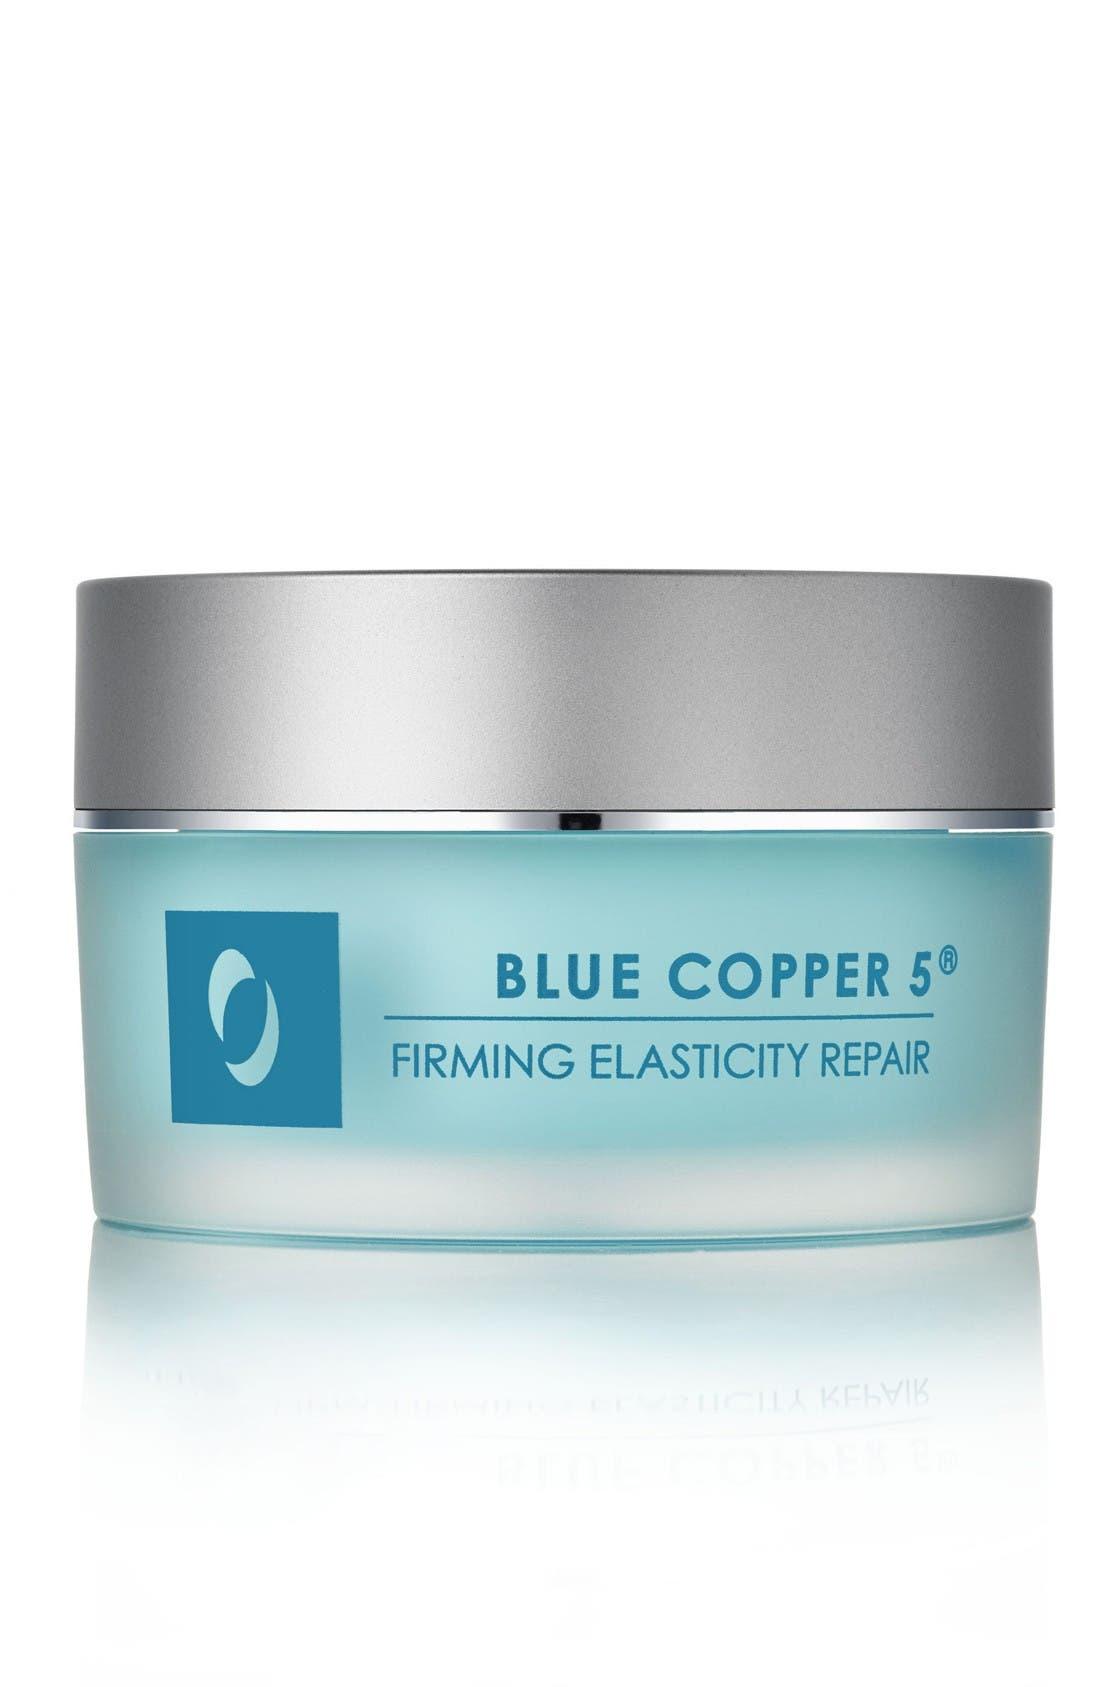 Alternate Image 1 Selected - Osmotics Cosmeceuticals Blue Copper 5 Firming Elasticity Repair